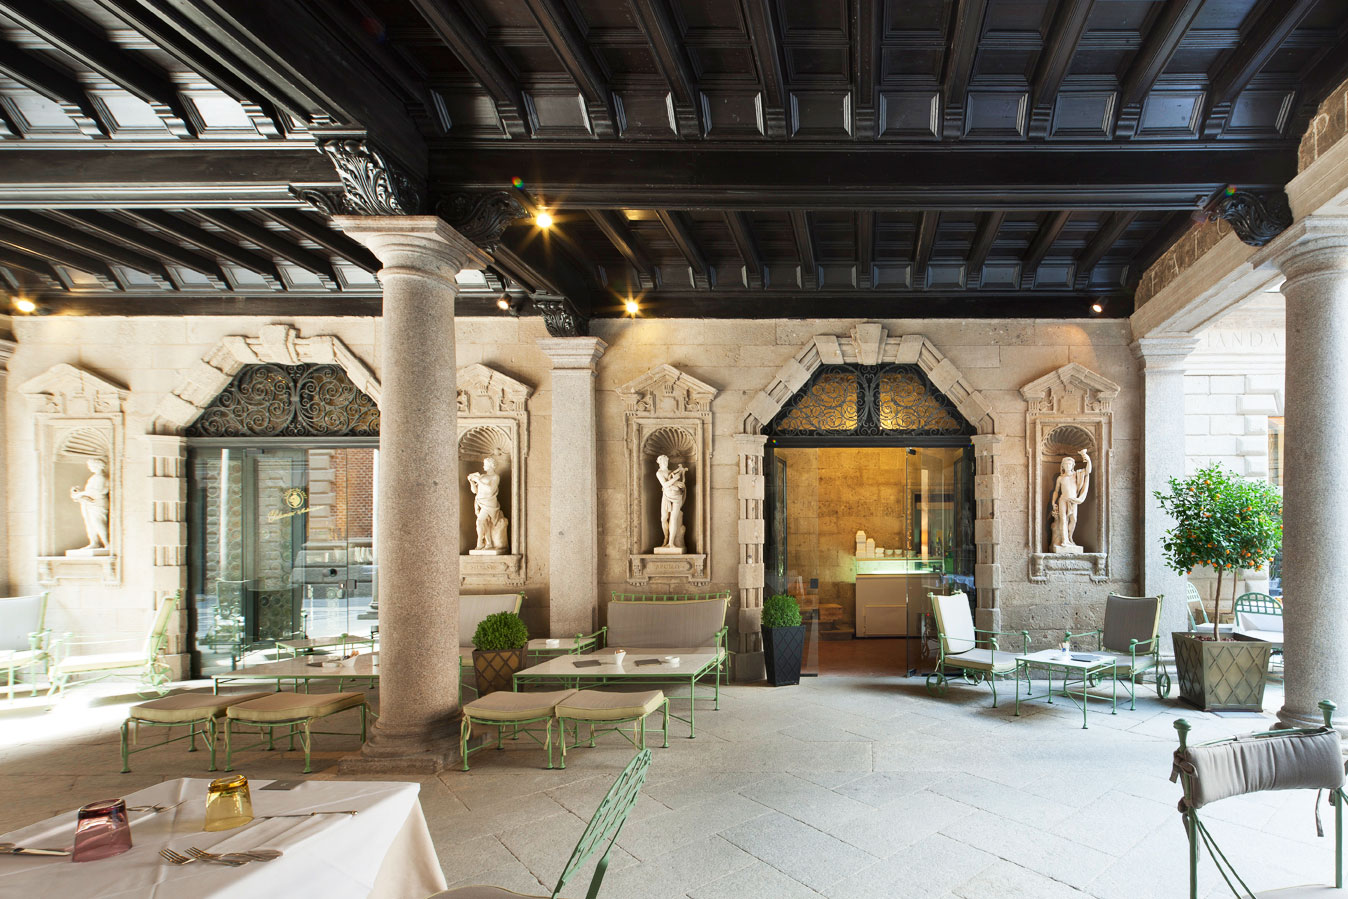 restaurangen Il salumaio di Montenapoleone i Milano